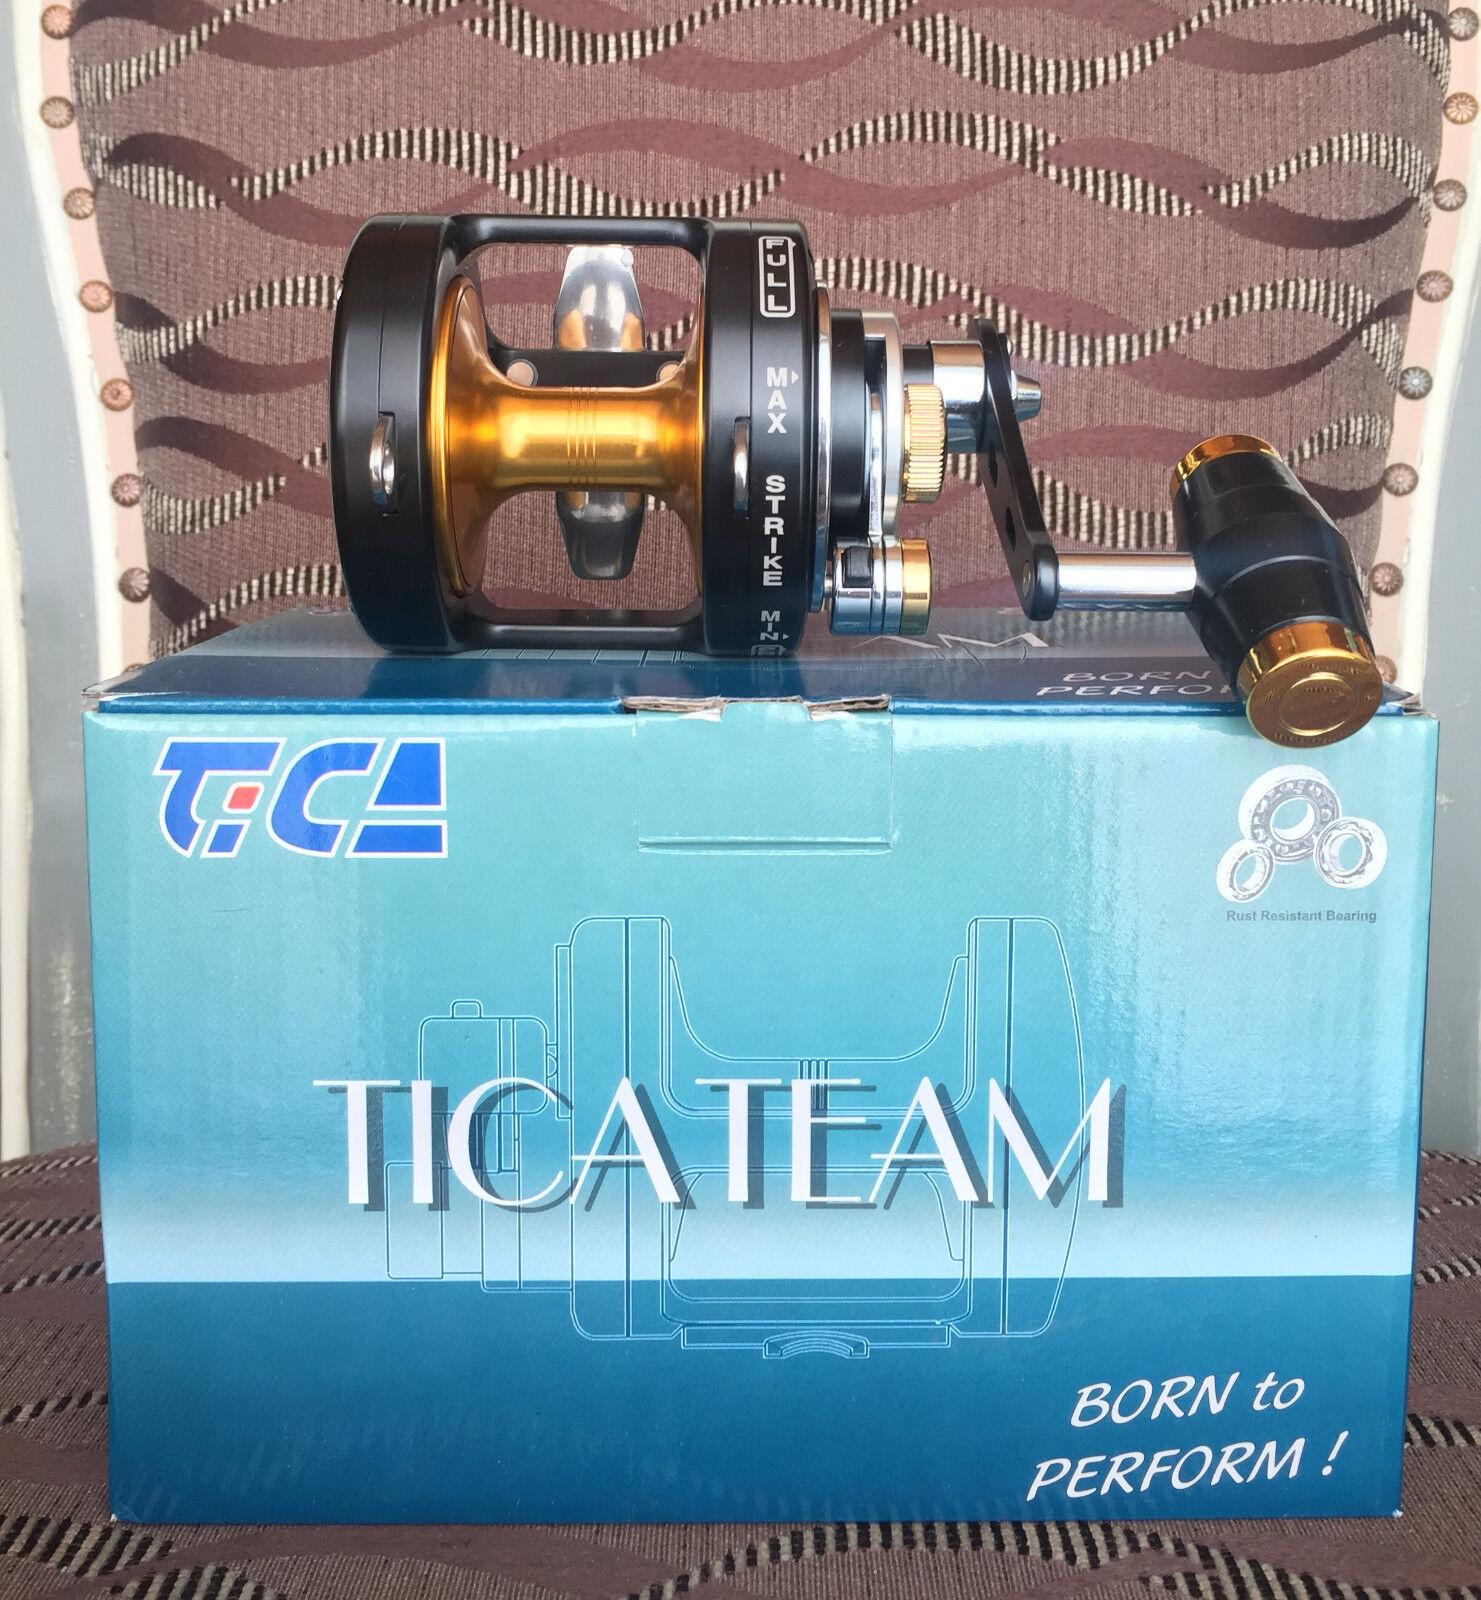 Tica Team st458r Multi Rol